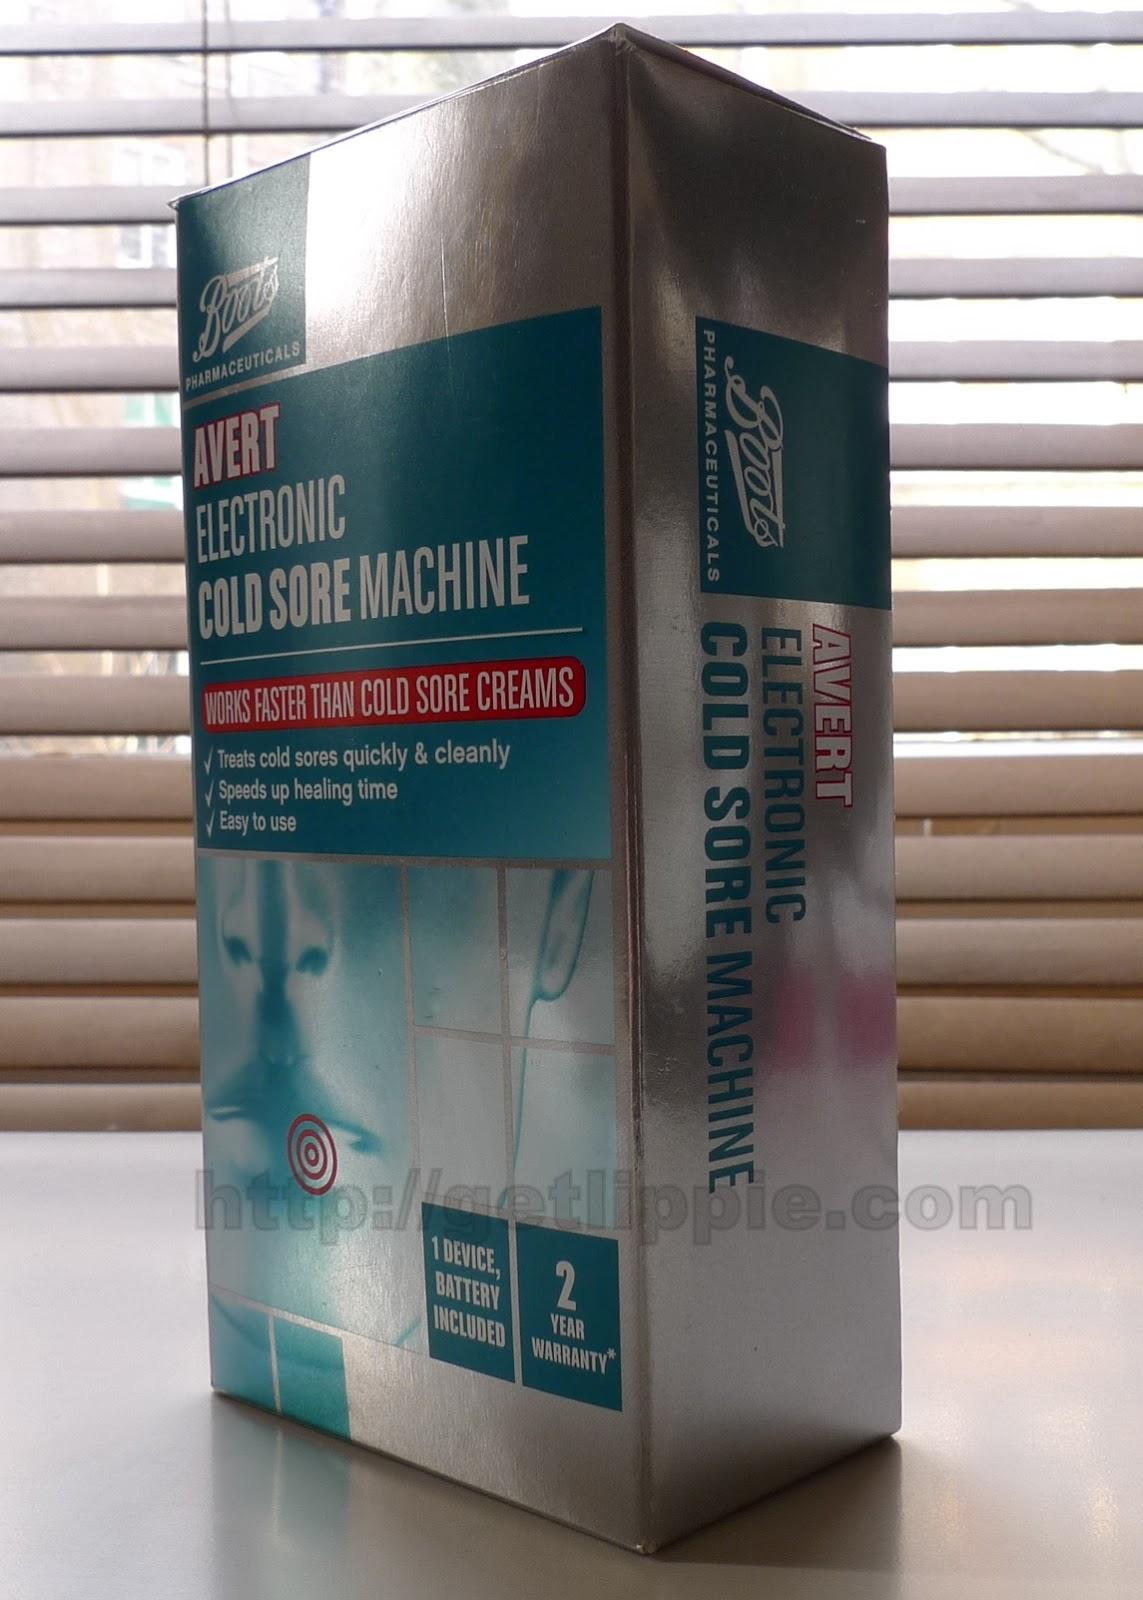 avert electronic cold sore machine